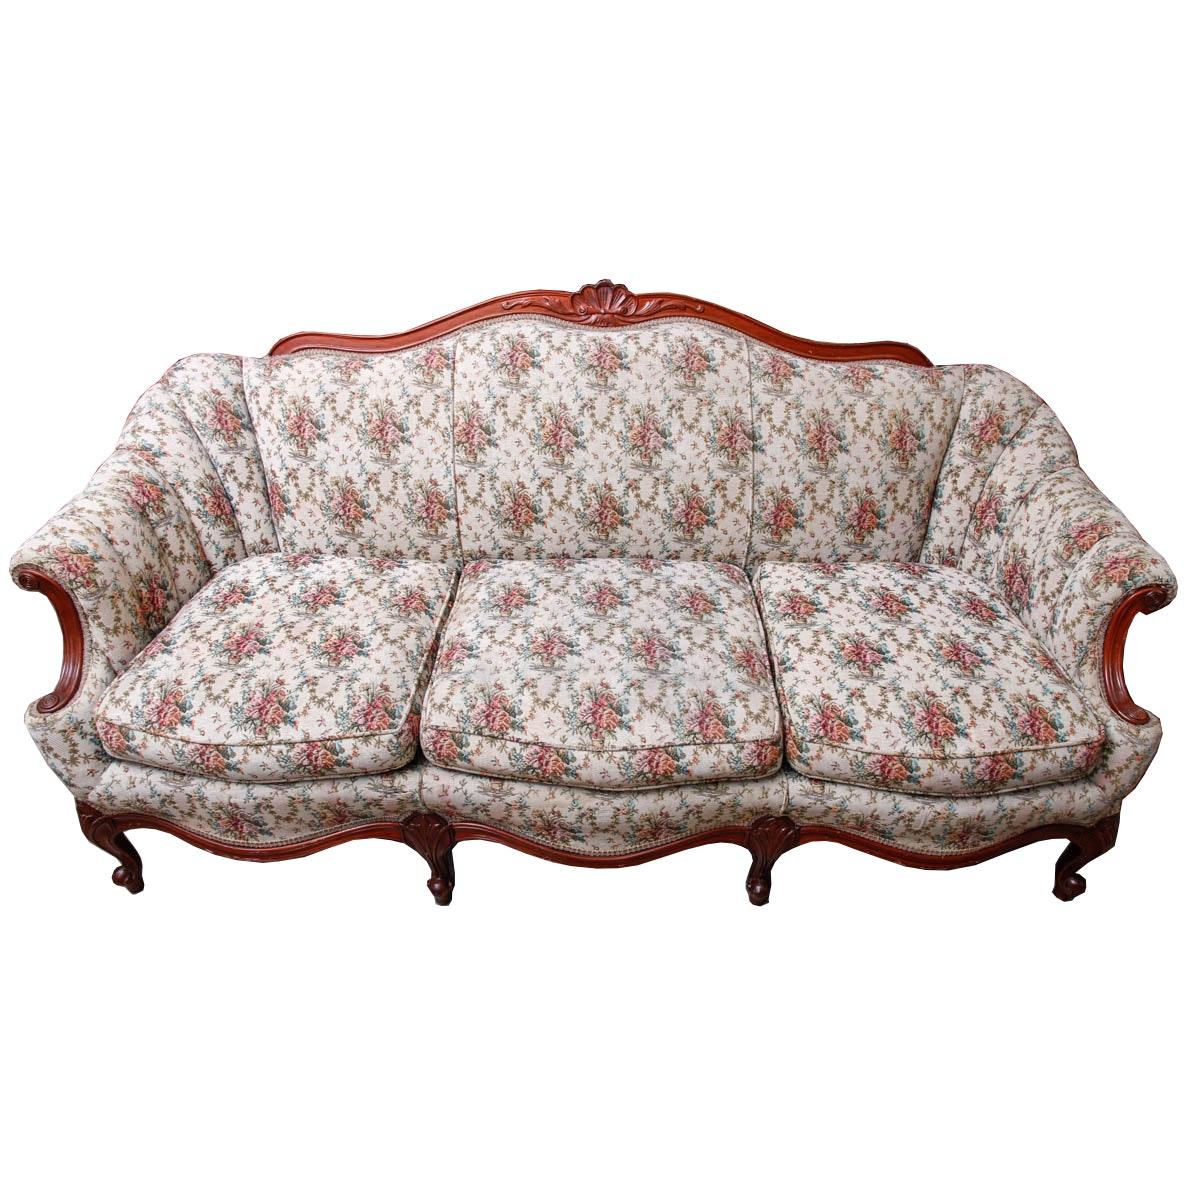 Vintage Queen Anne Style Sofa